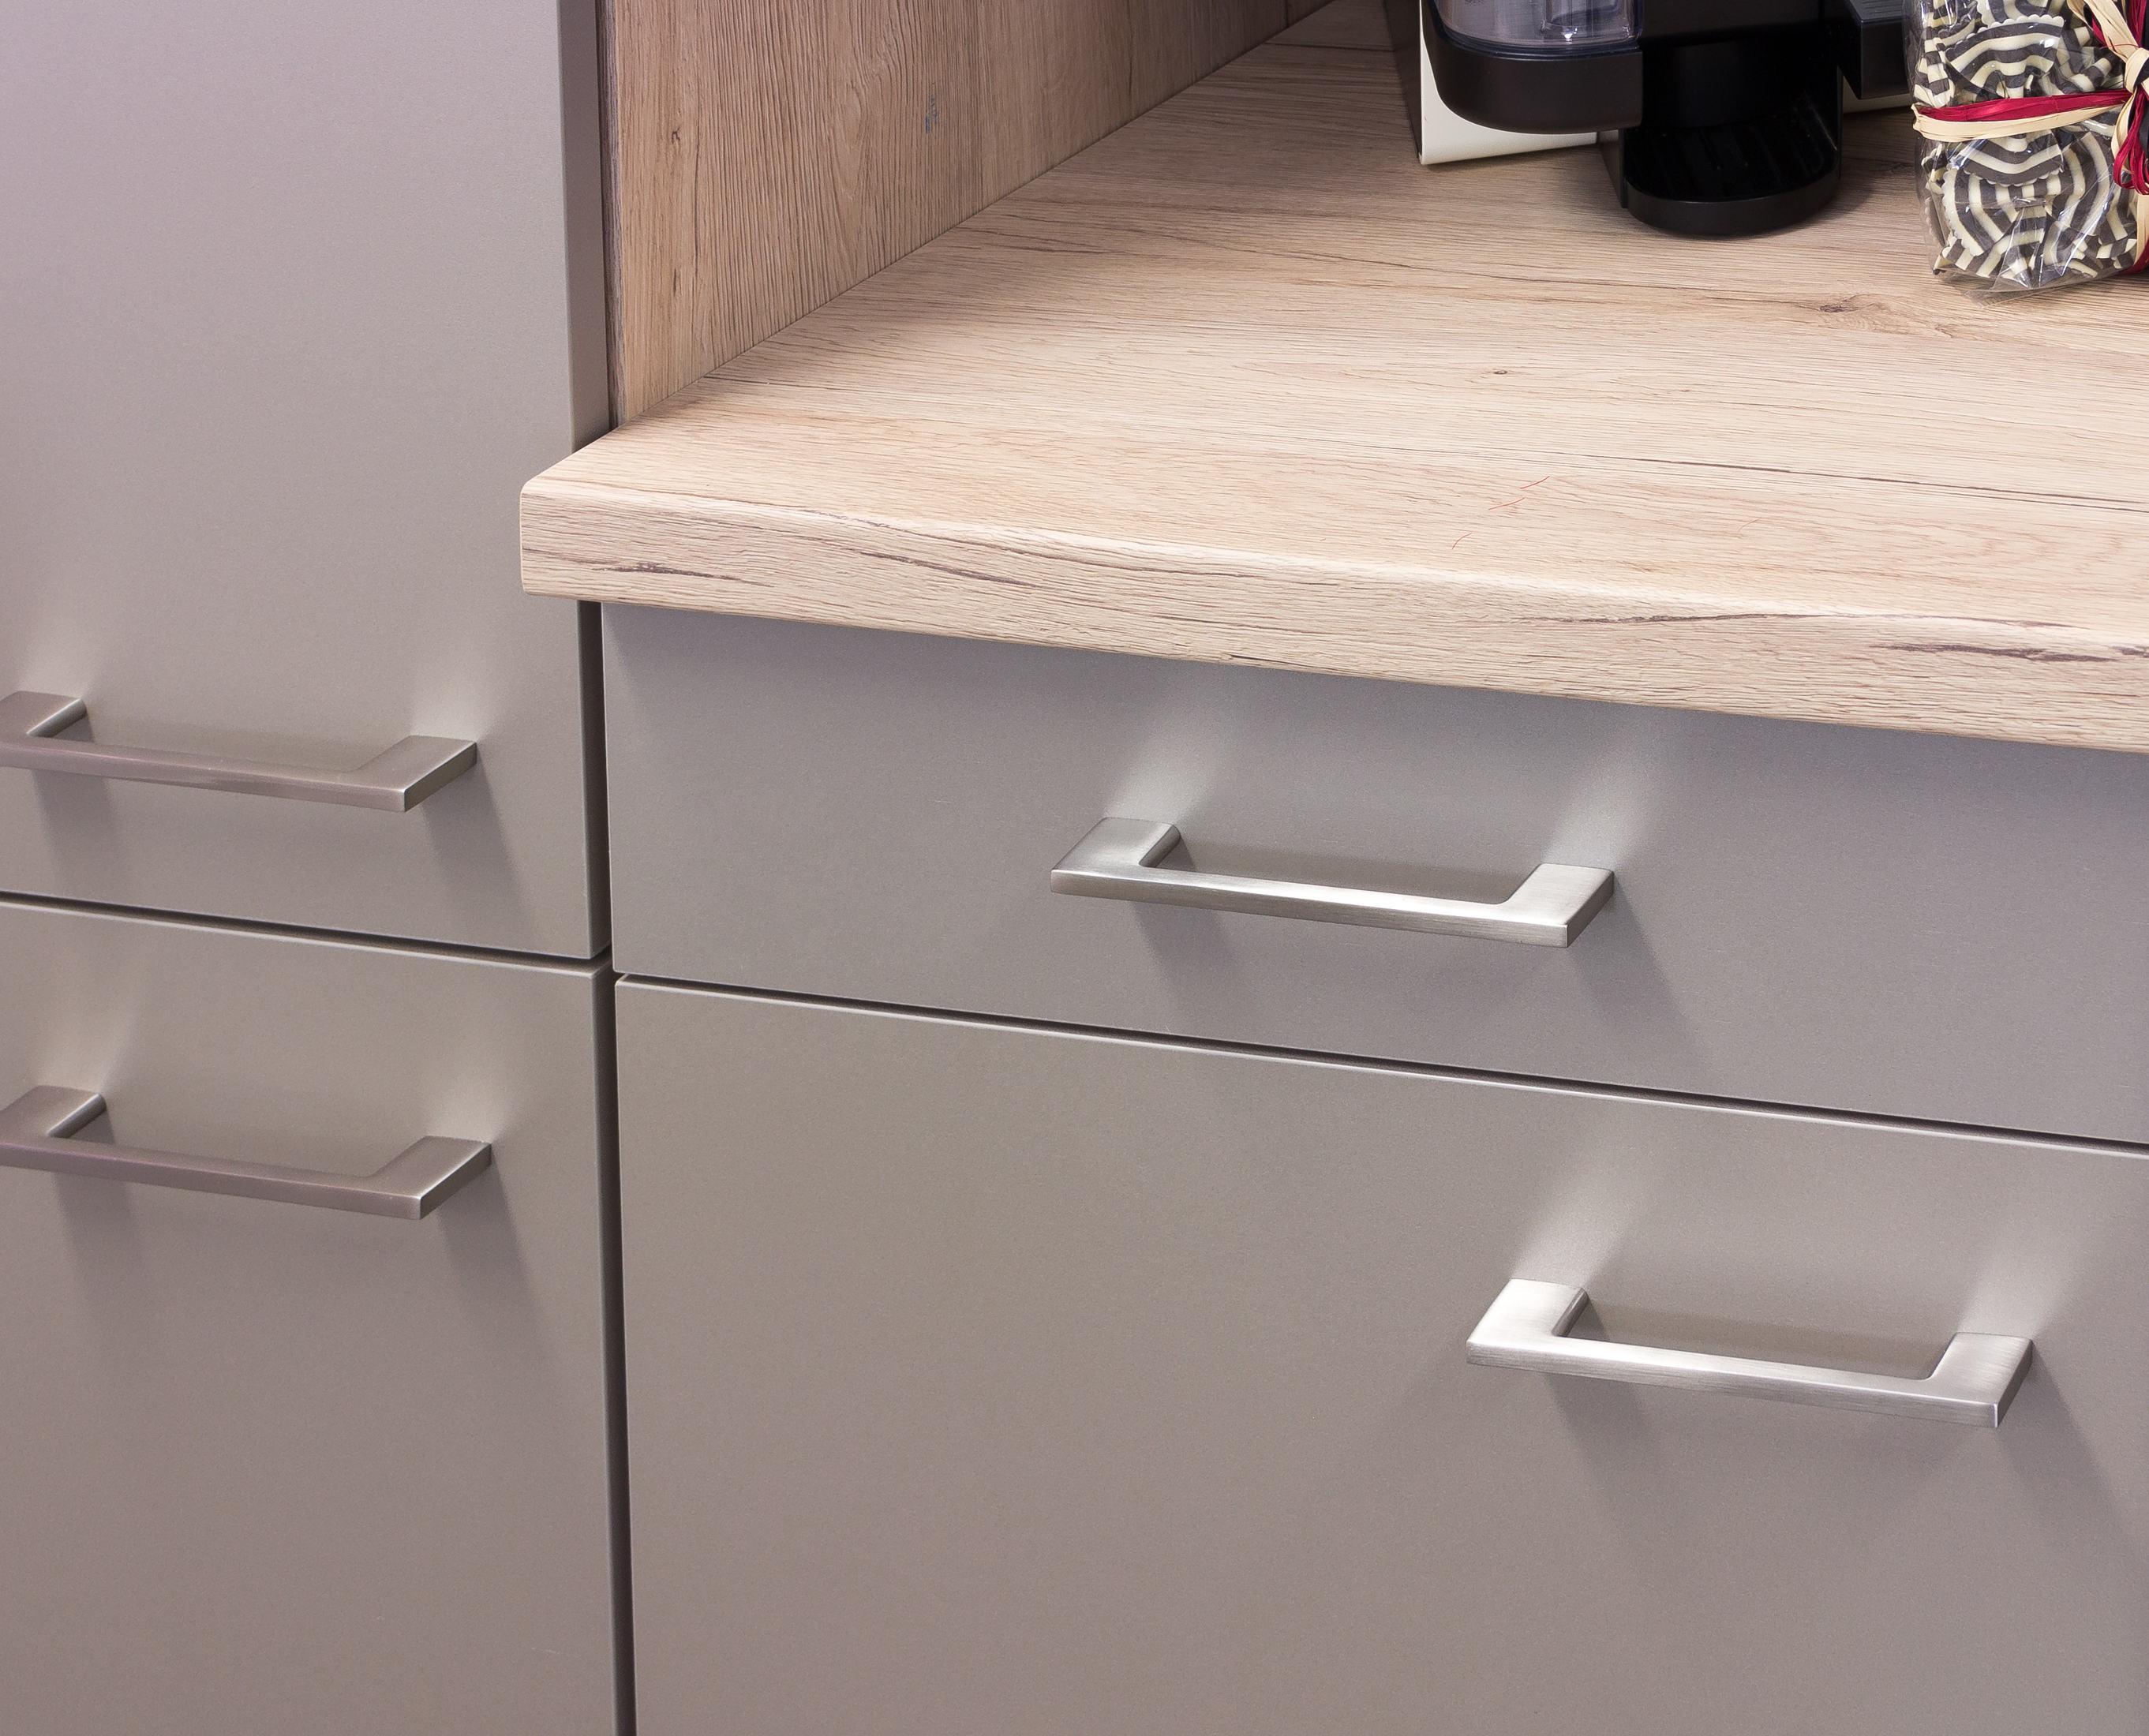 eckküche riva - l-küche ohne e-geräte - breite 280 x 170 cm